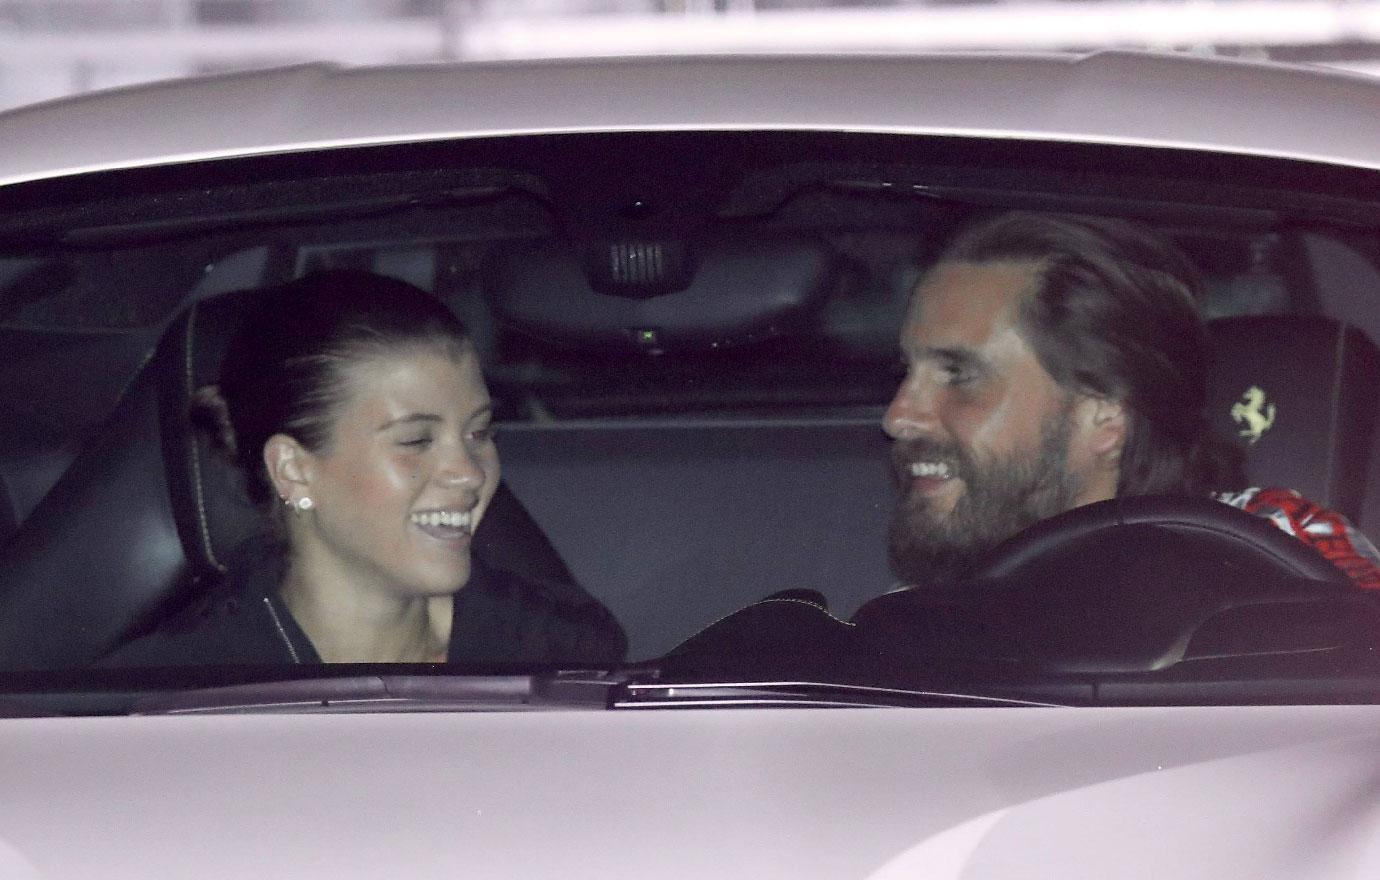 Scott Disick And Sofia Richie Leave Restaurant Date